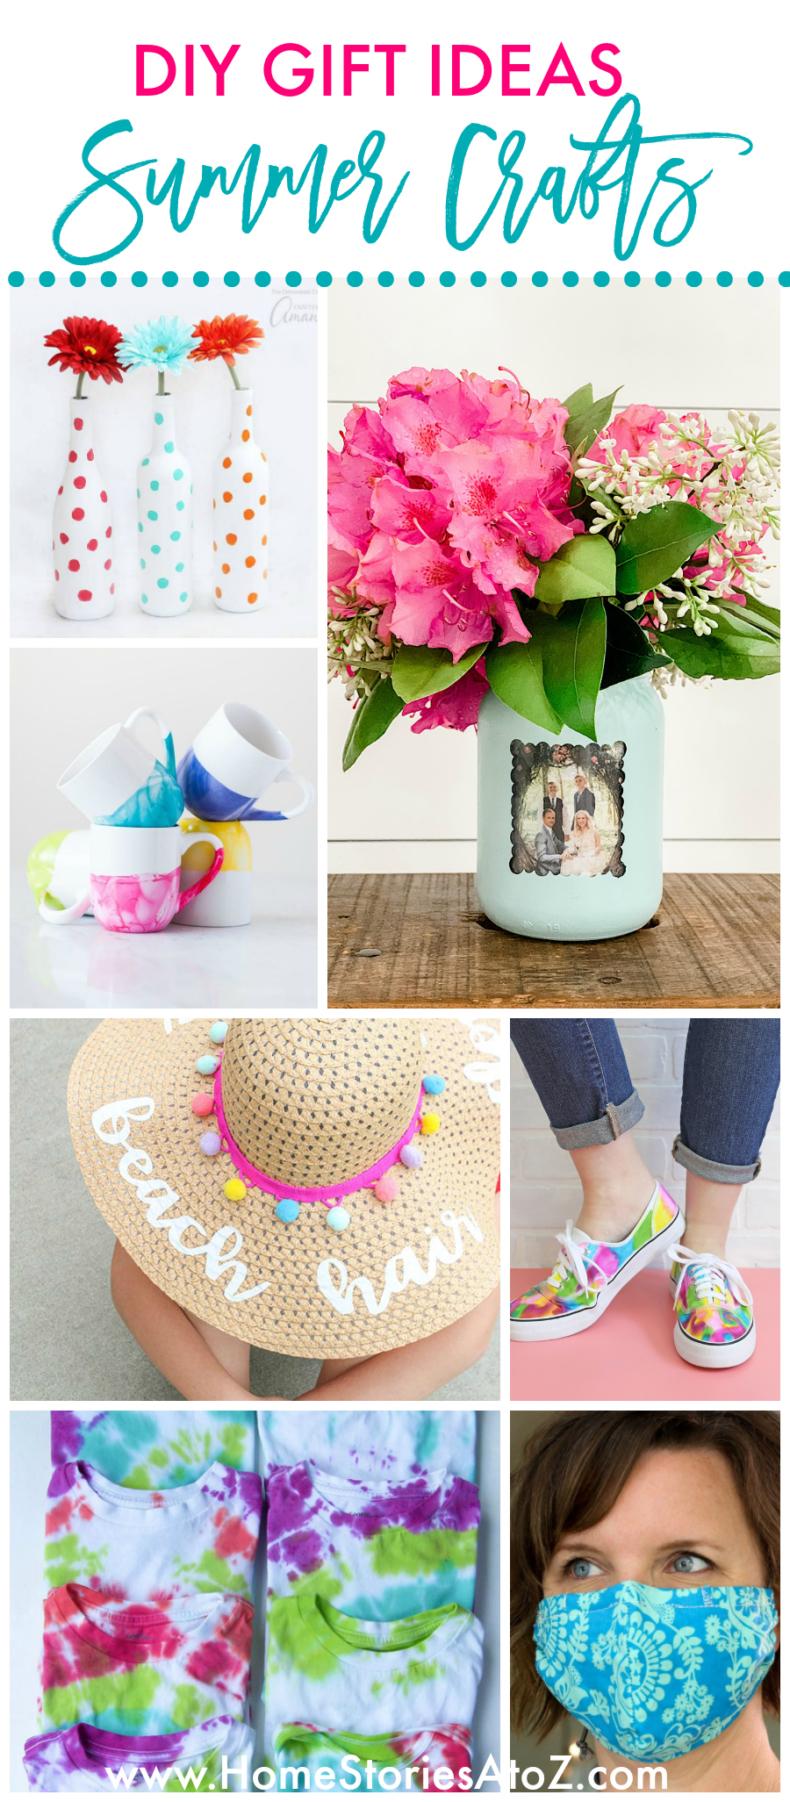 DIY Gifts - Summer Ideas